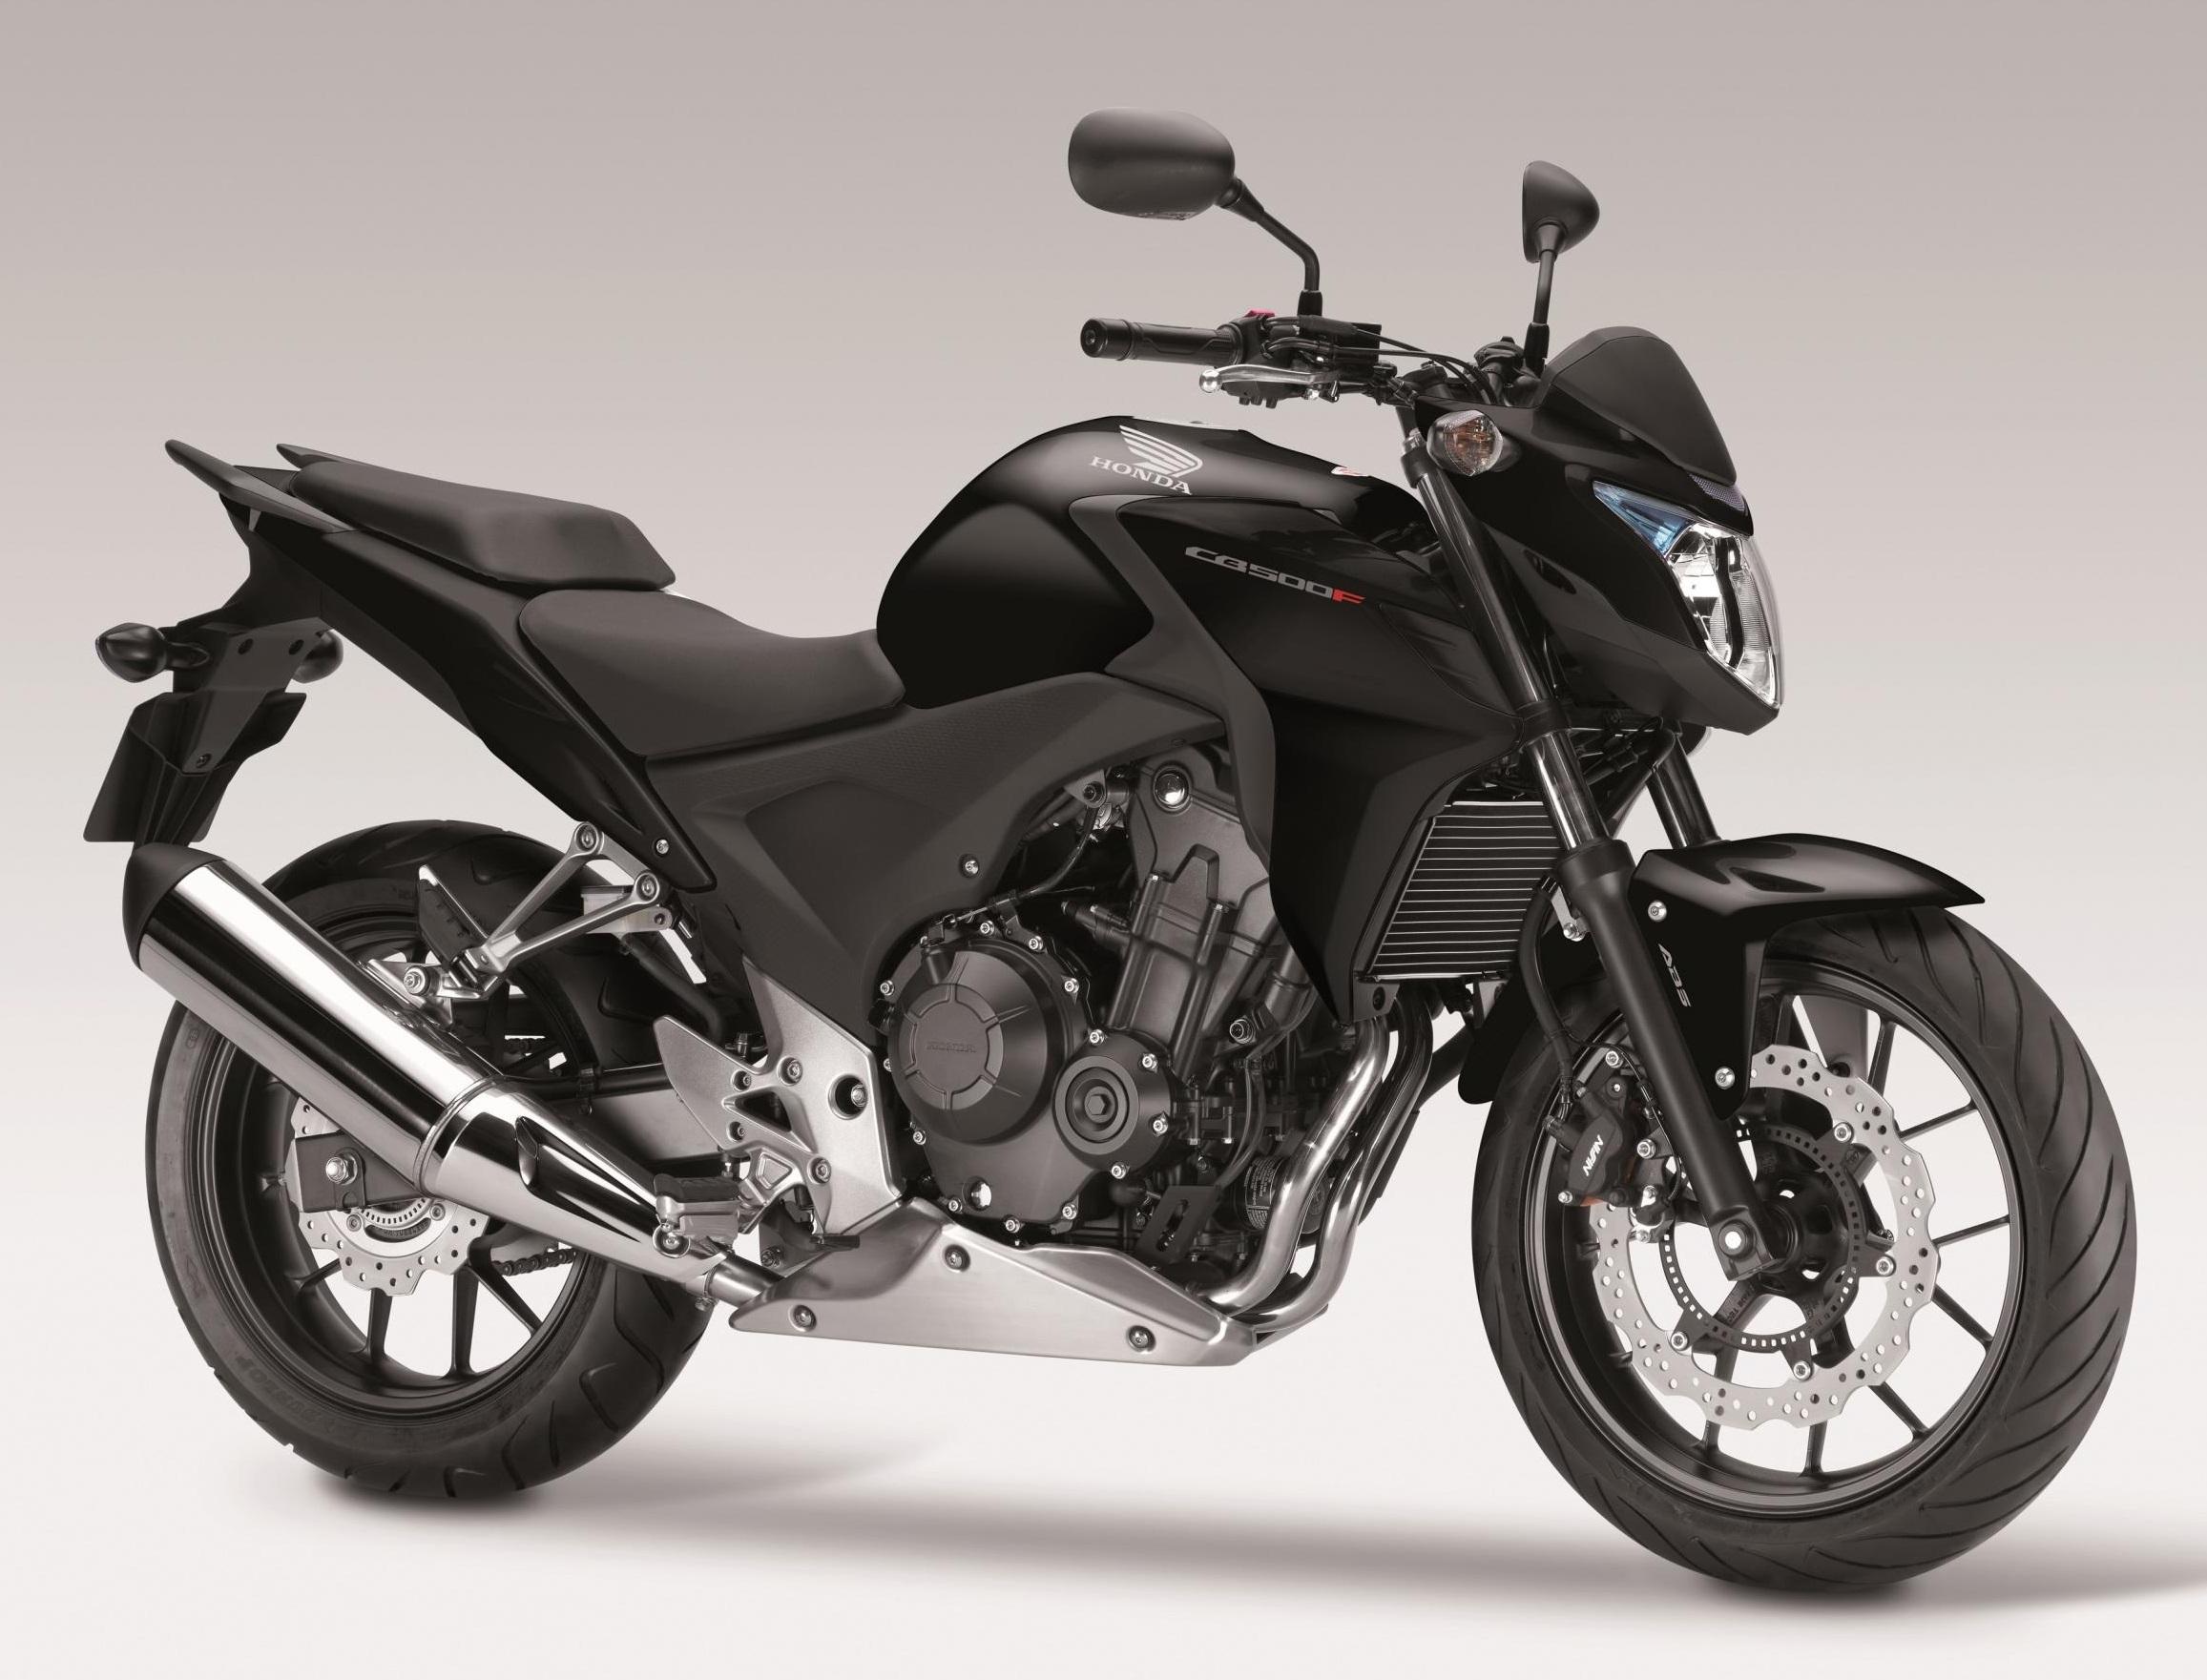 For Sale Honda Cb500f The Bike Market Hero 2014